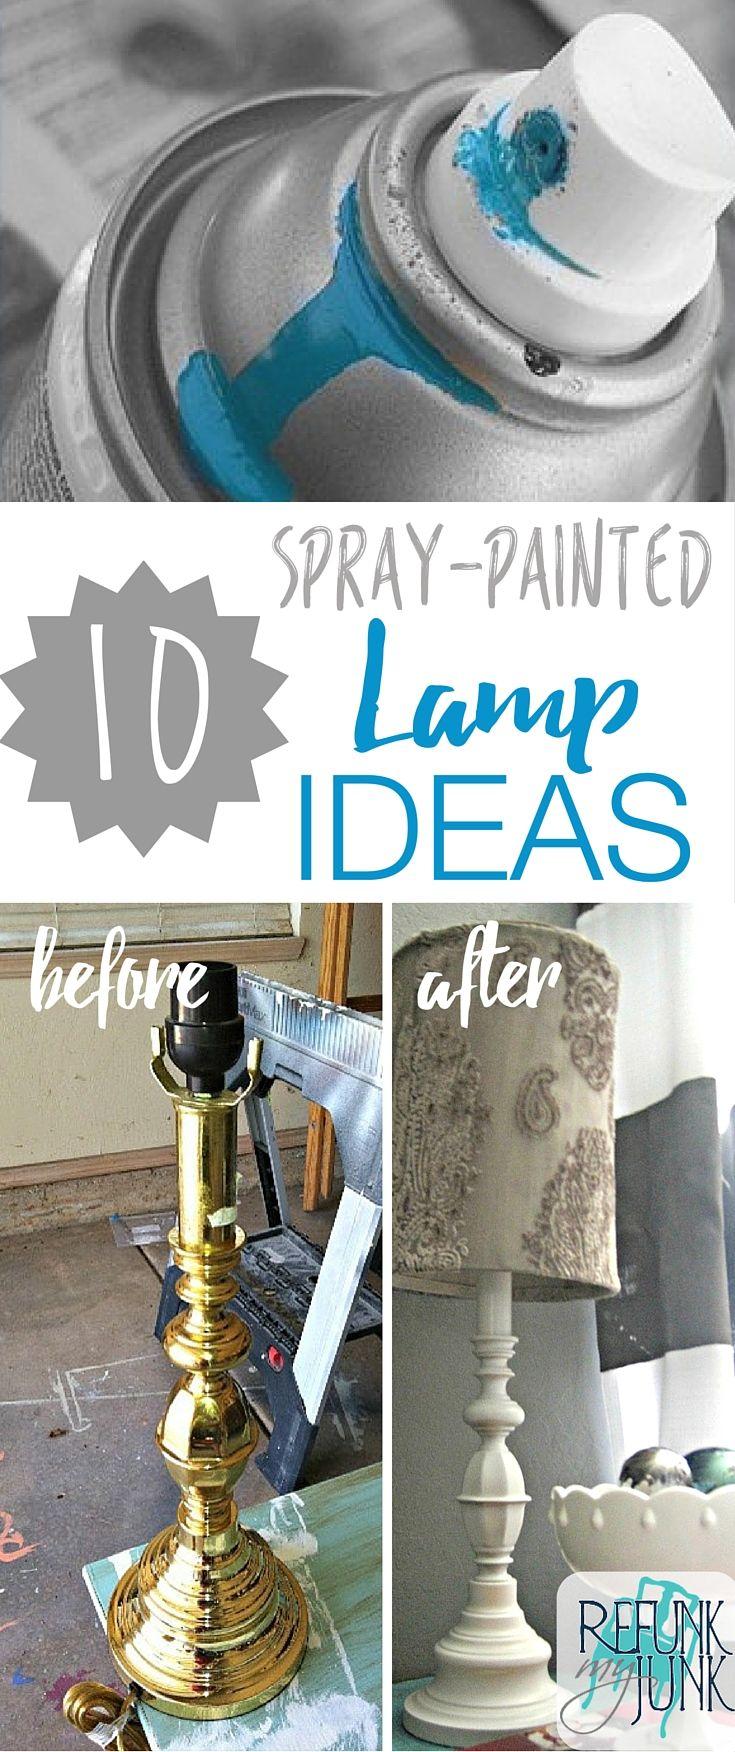 Best 25+ Paint lamps ideas on Pinterest | Spray paint ...